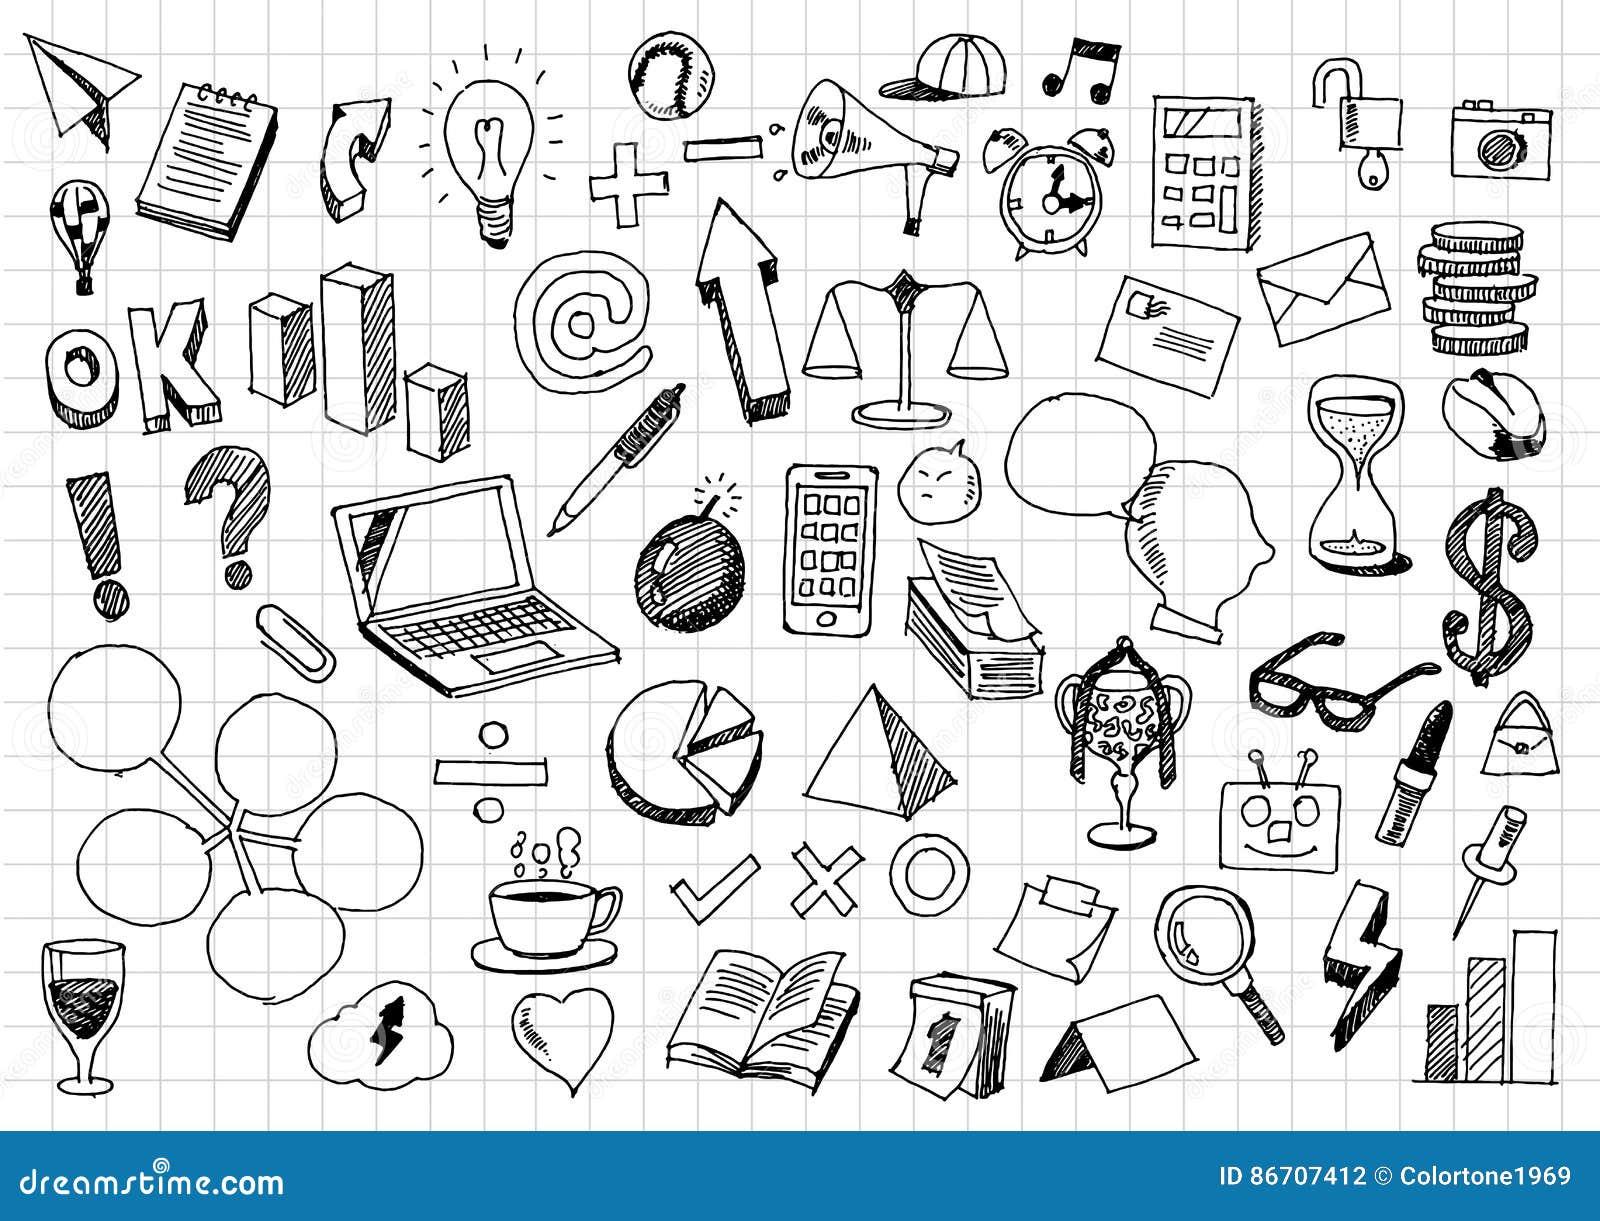 business doodles various sketch business graffiti stock vector